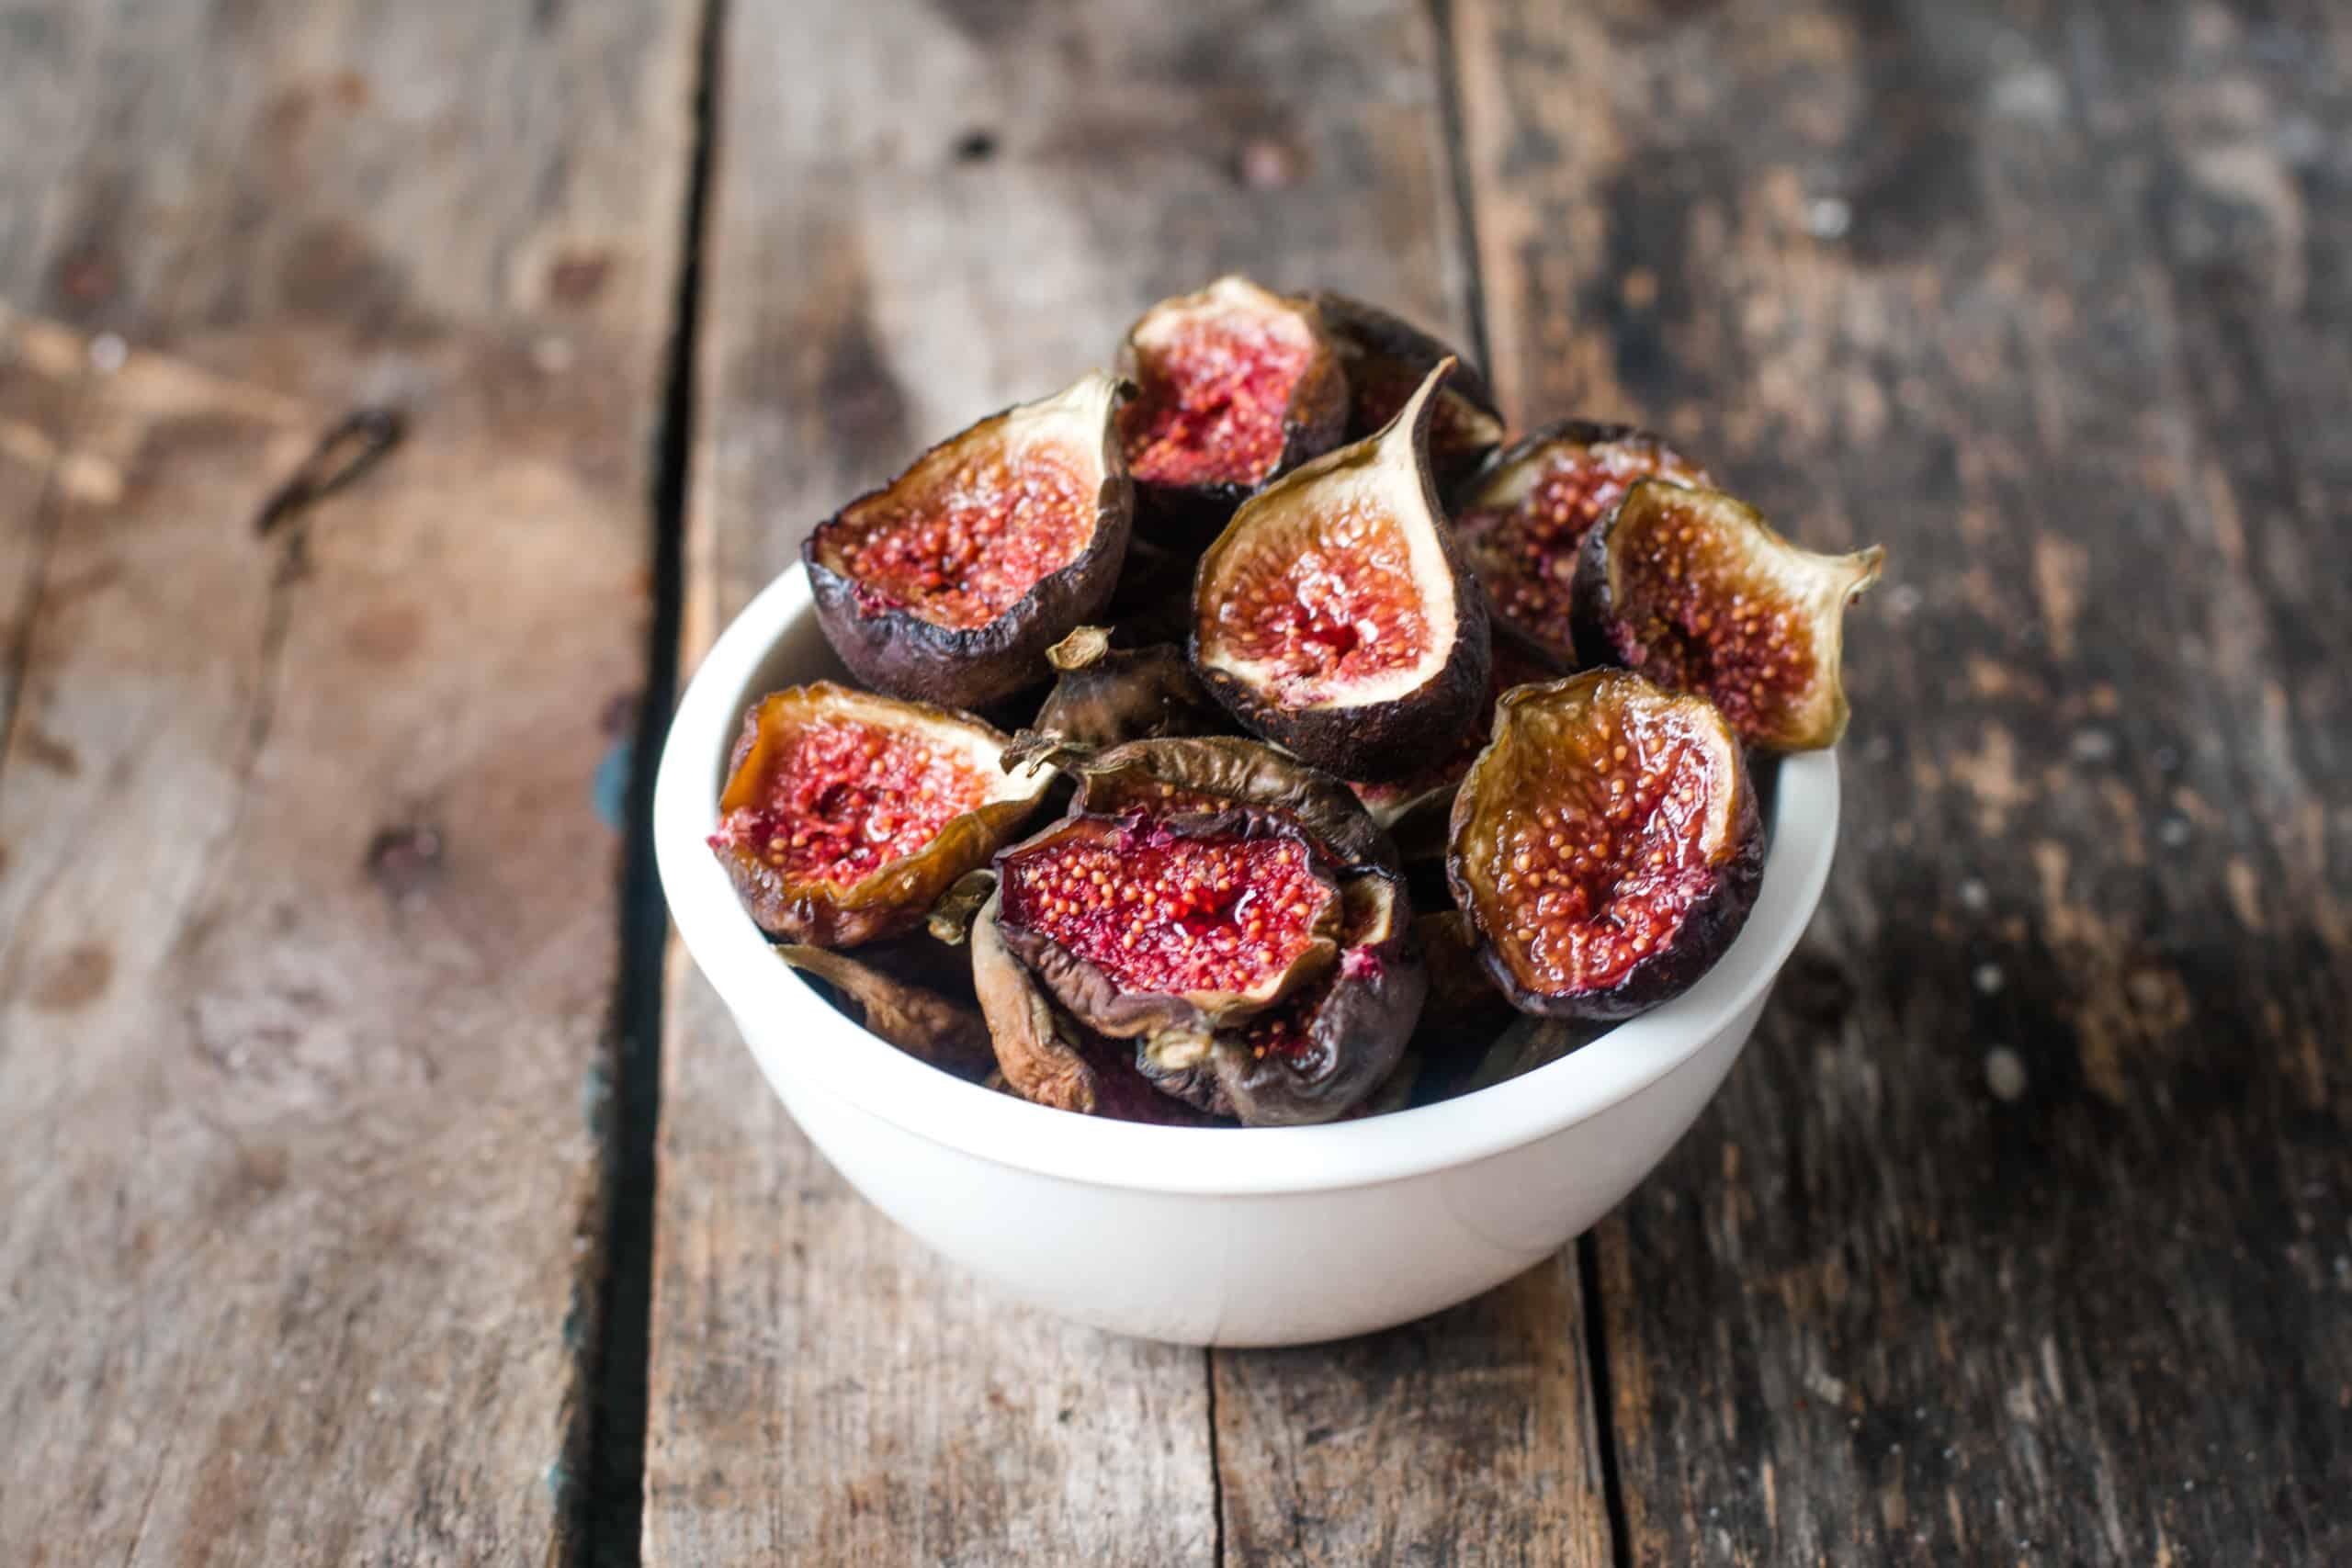 more than a dozen fig halves, drid in a small white bowl